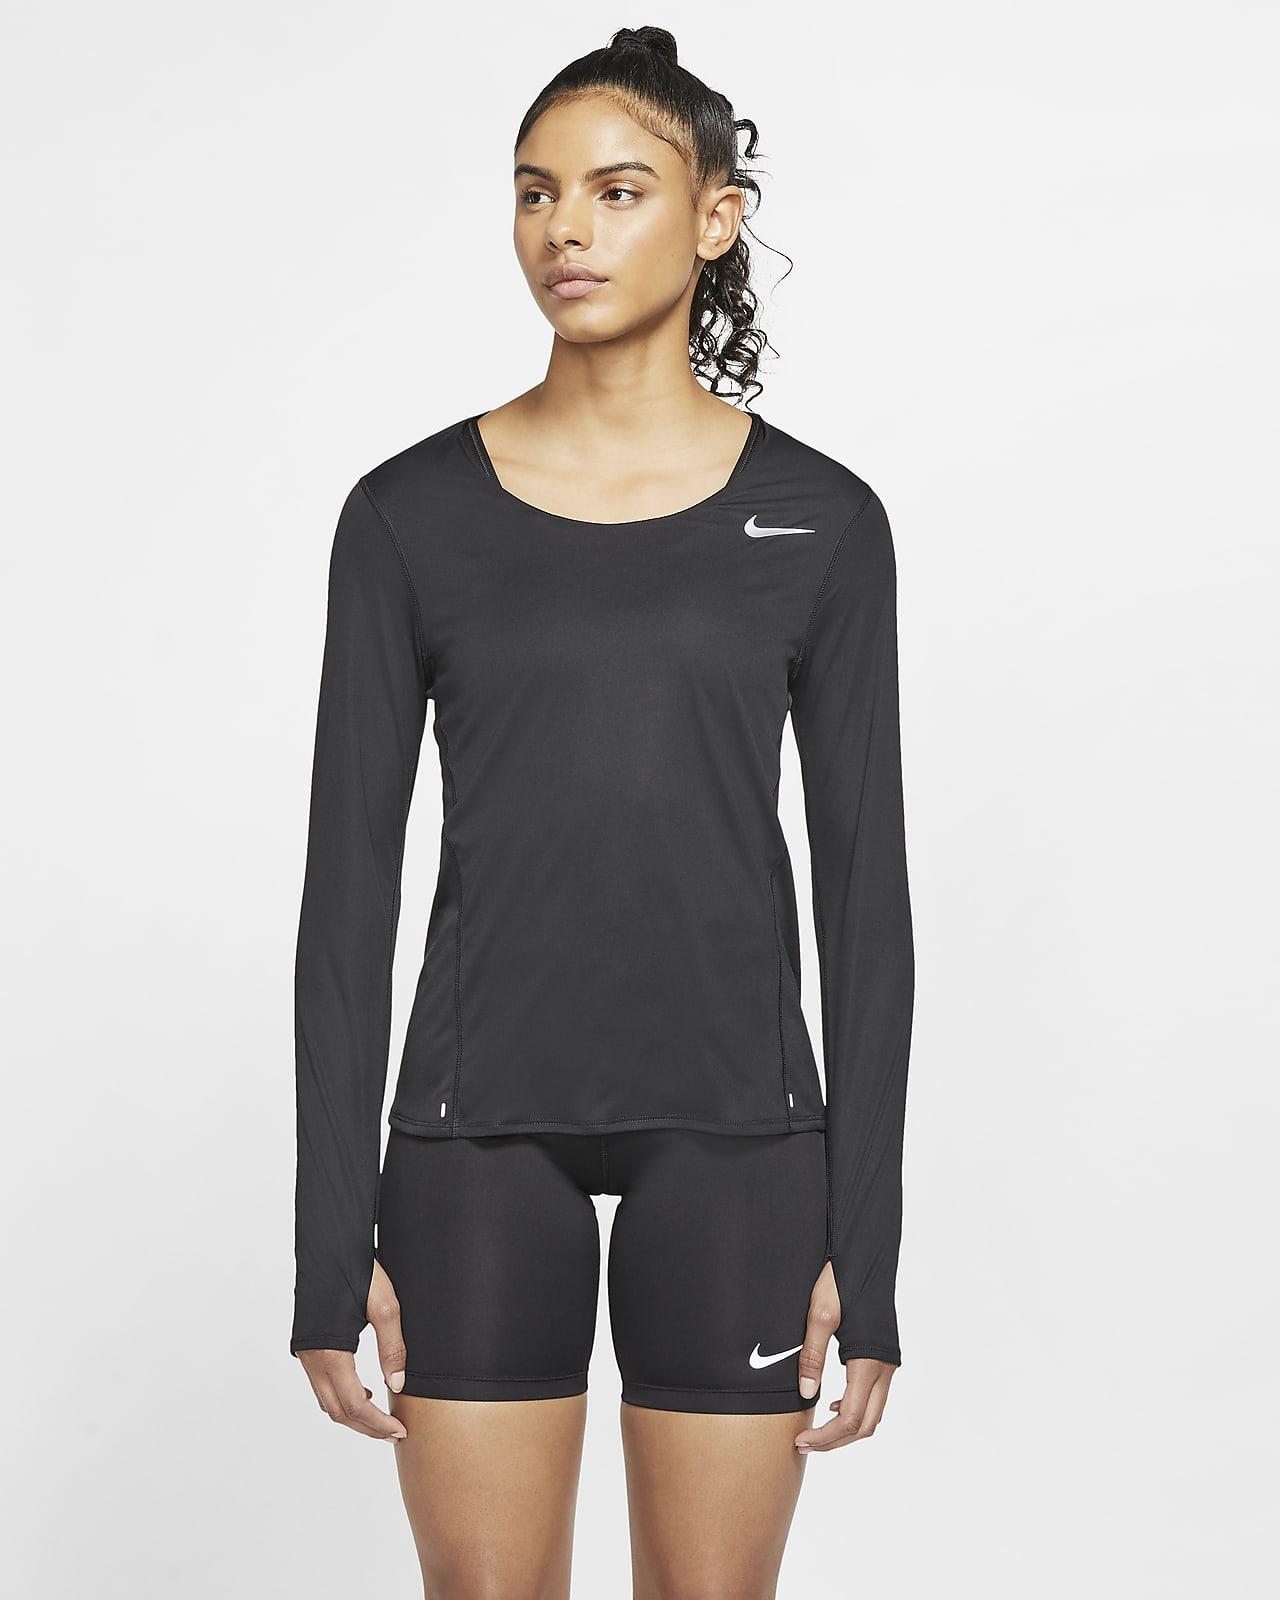 Long-Sleeve Running Top. Nike AU